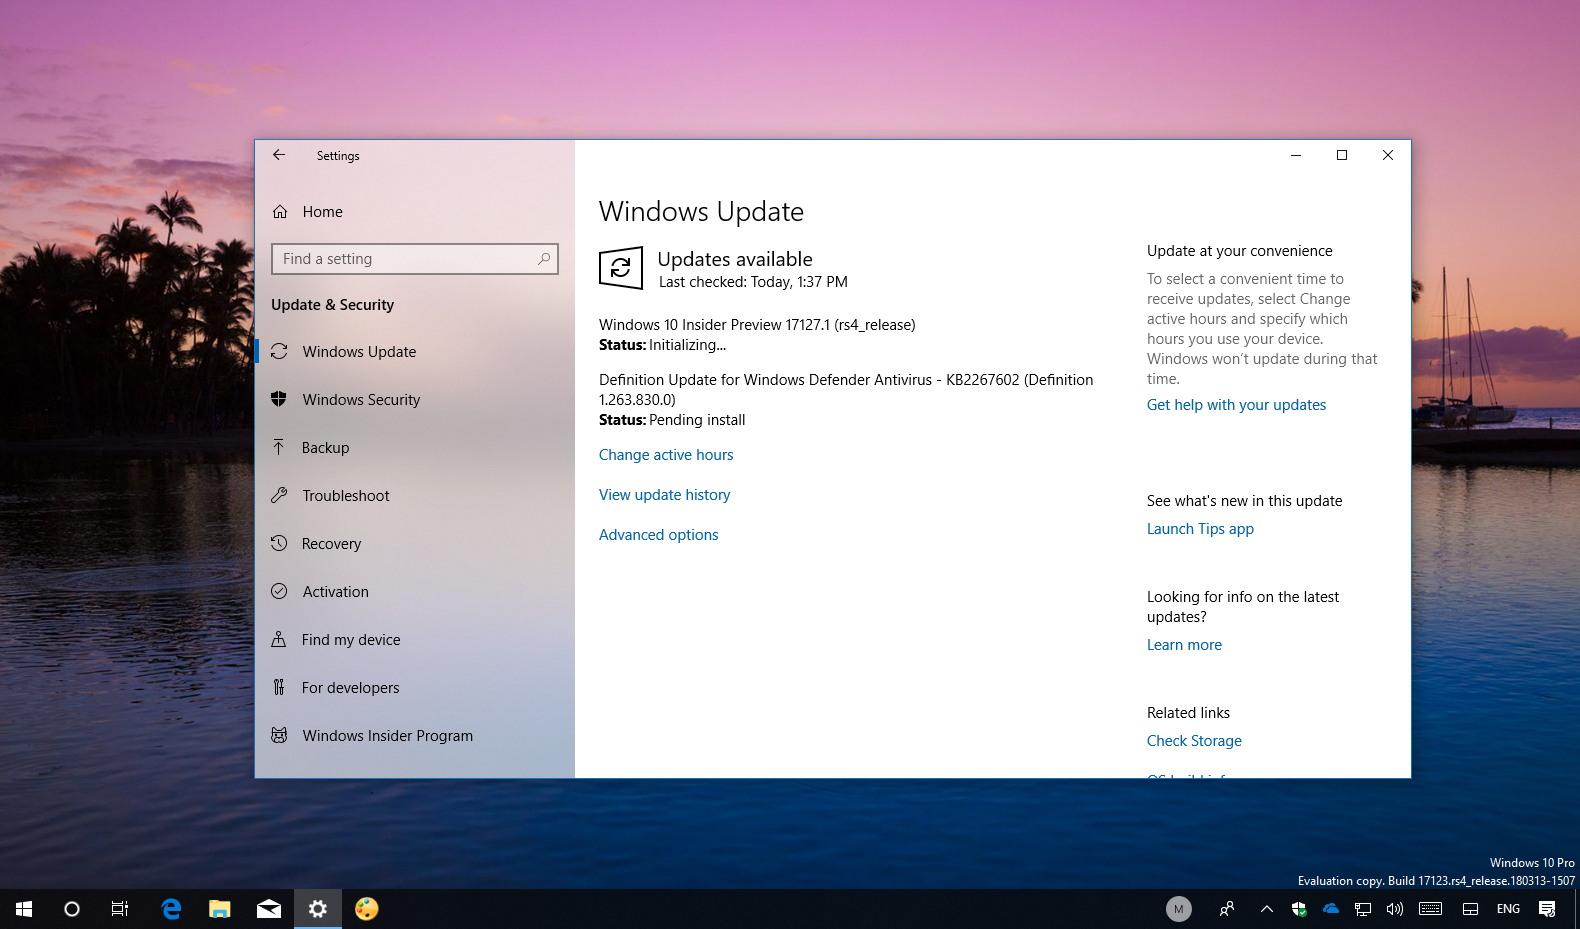 Windows 10 build 17127